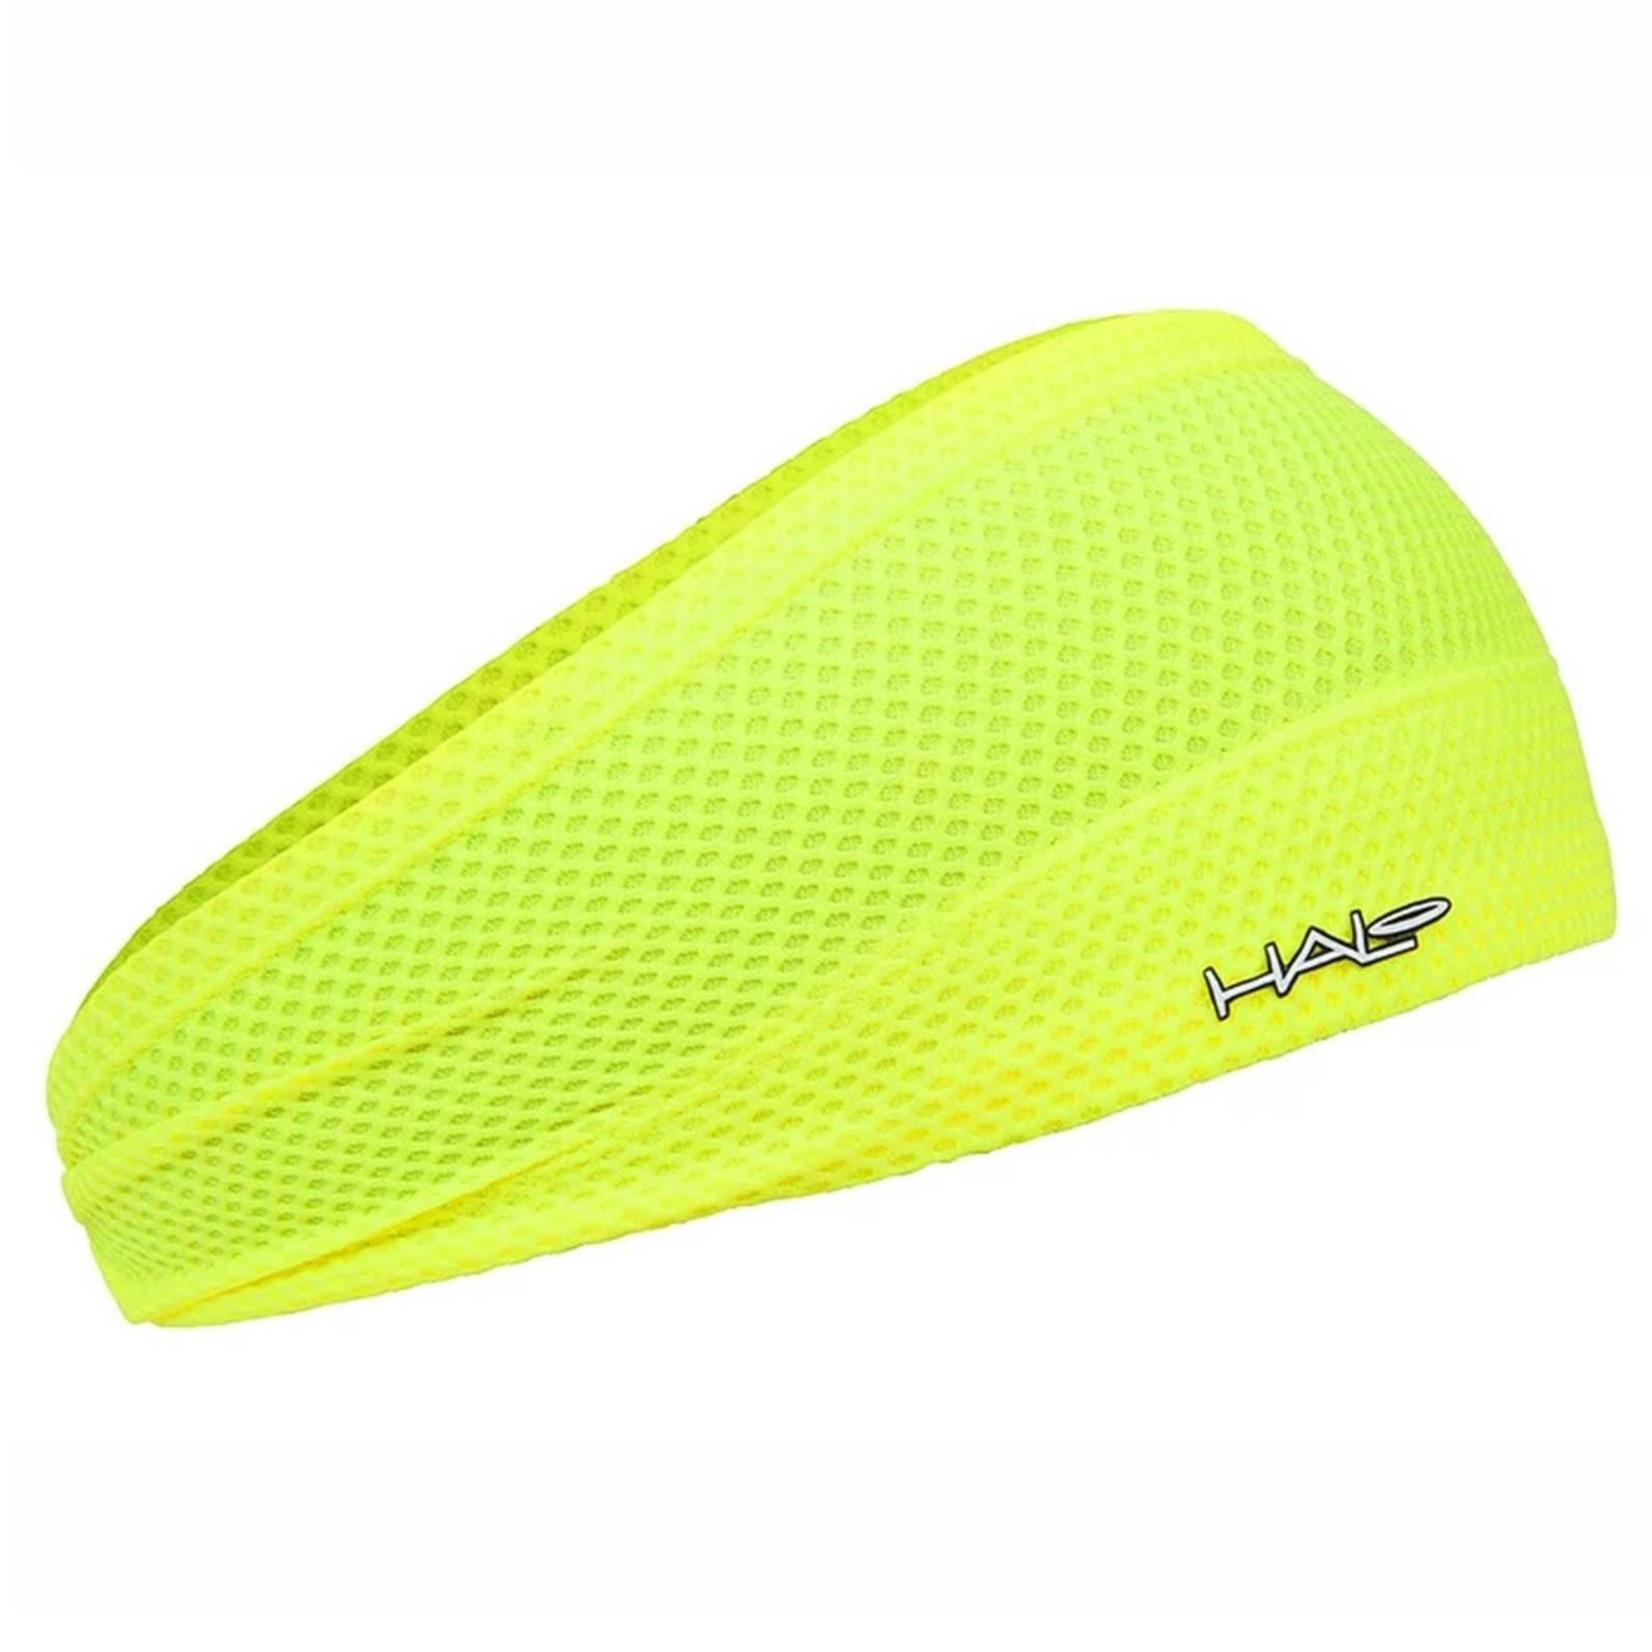 Halo Bandit Air Headband Green Flash